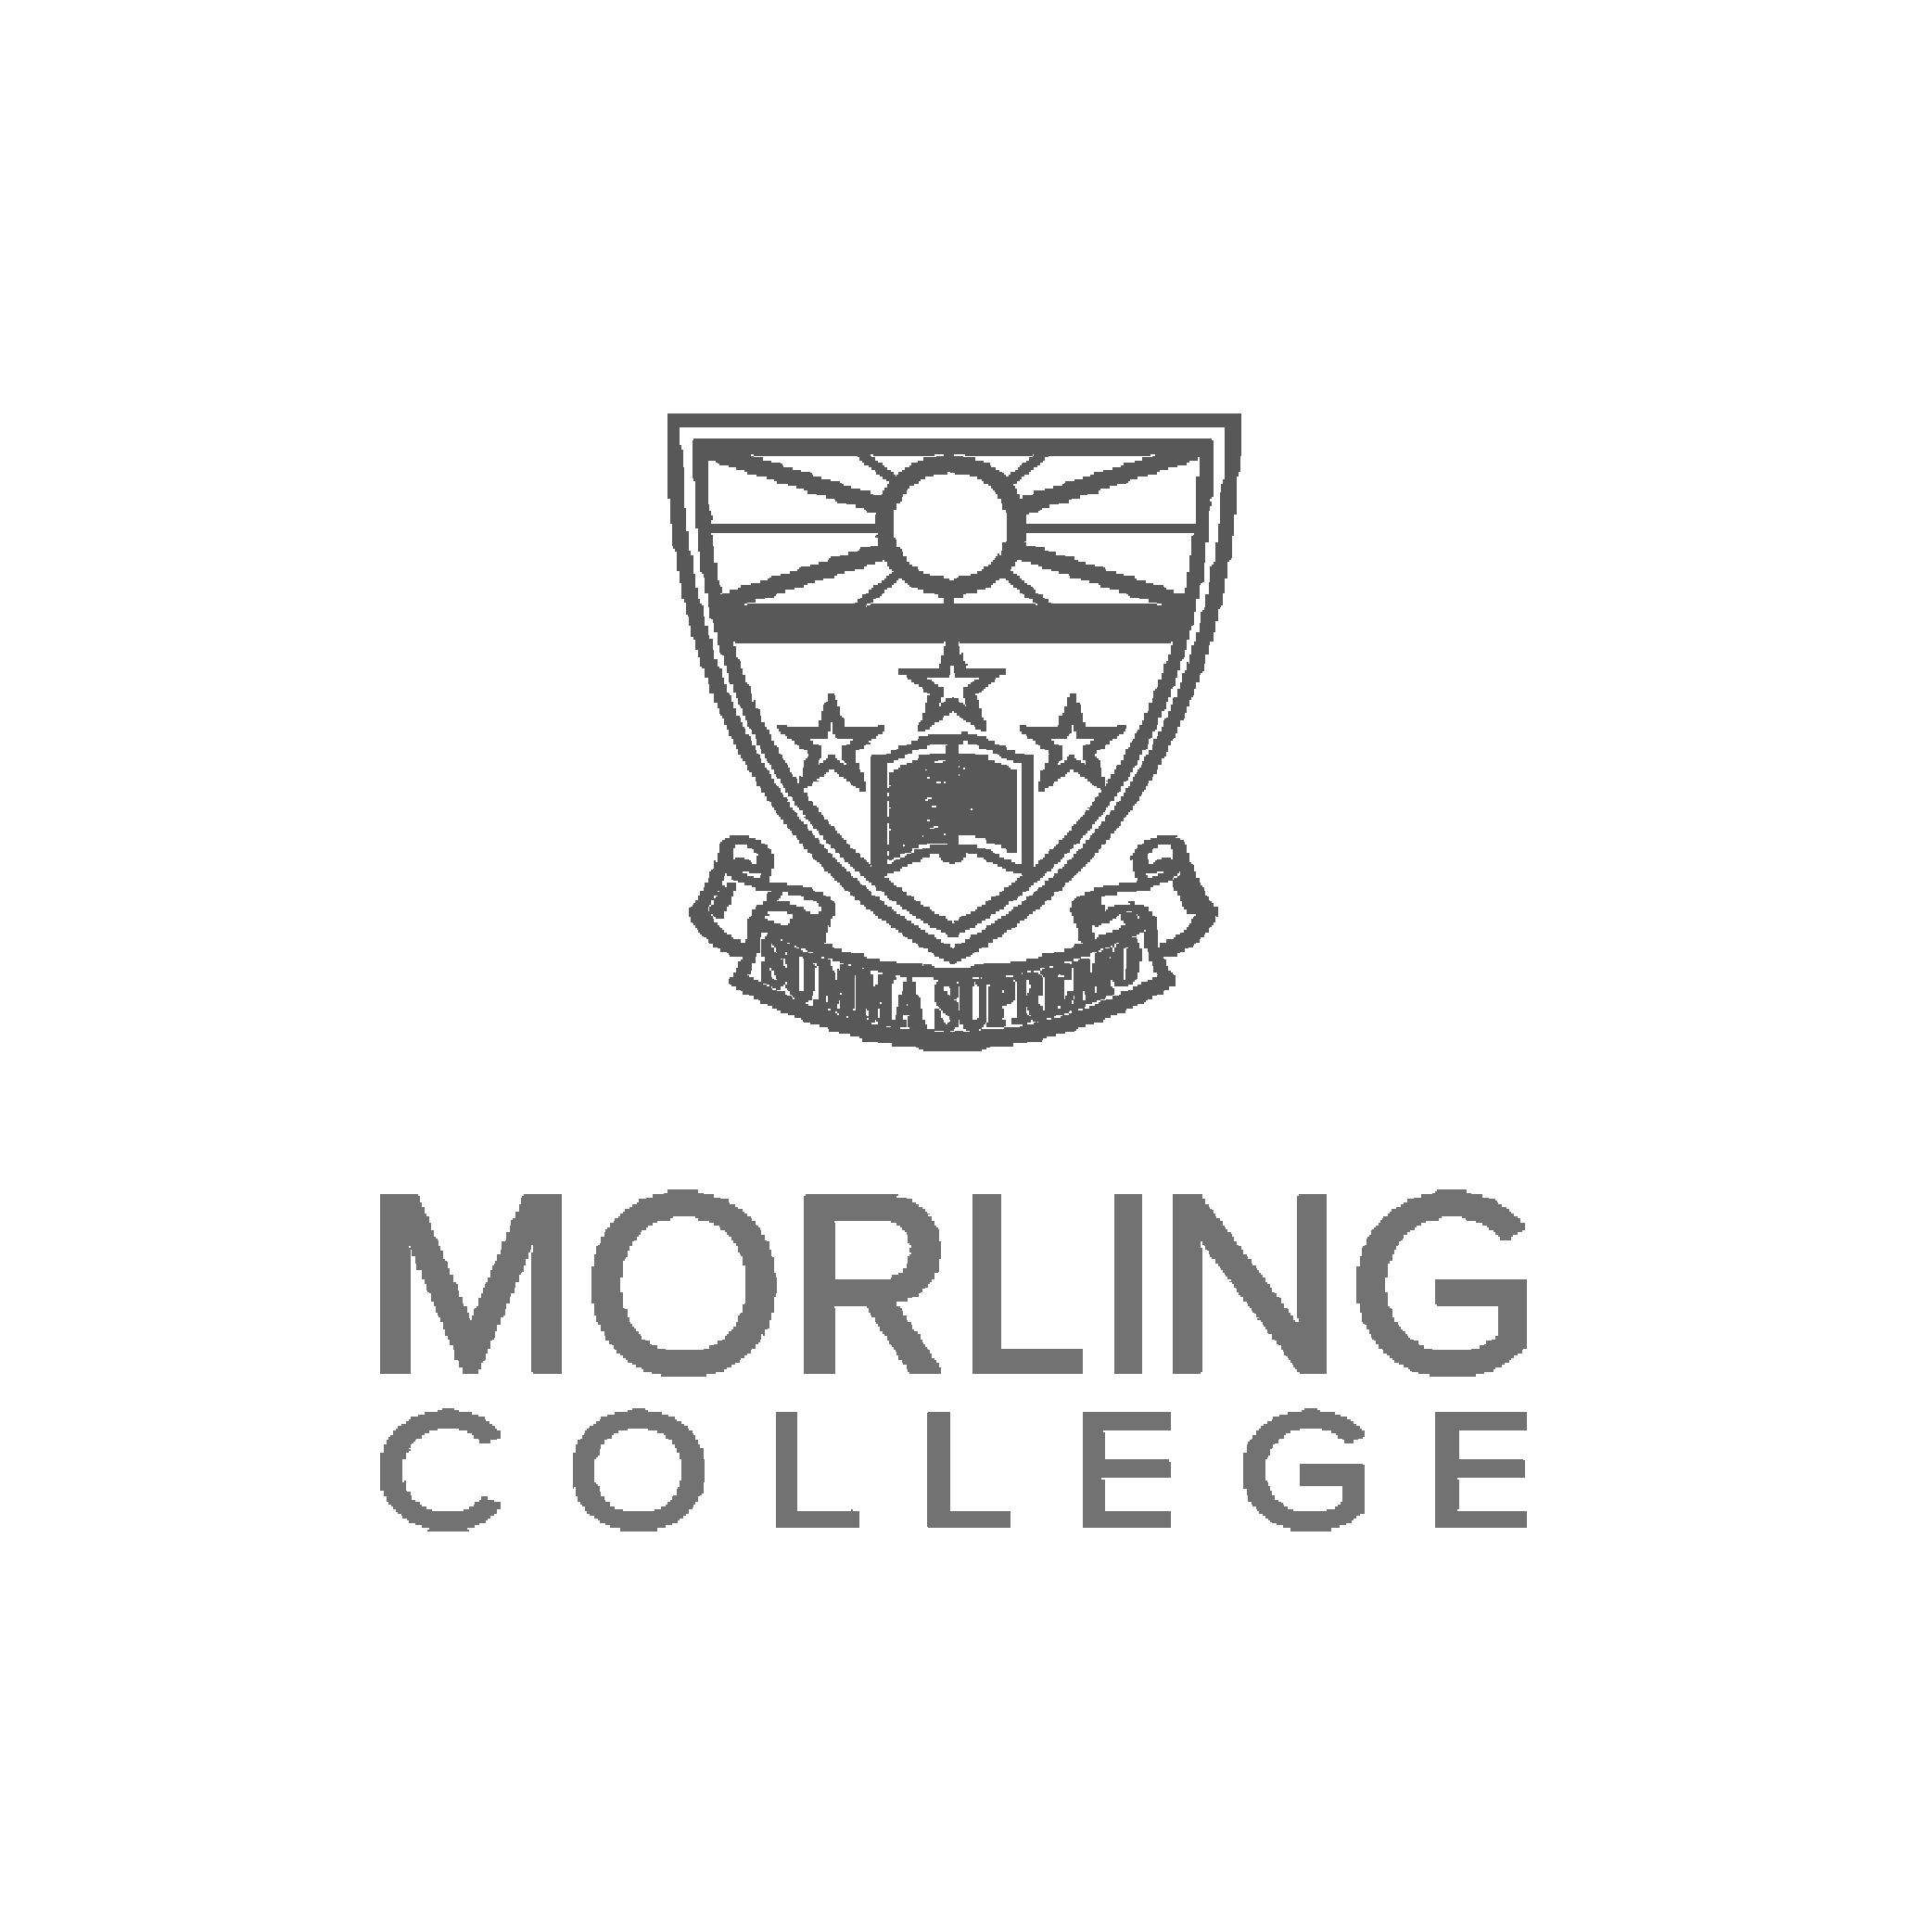 College Logos Square-Morling